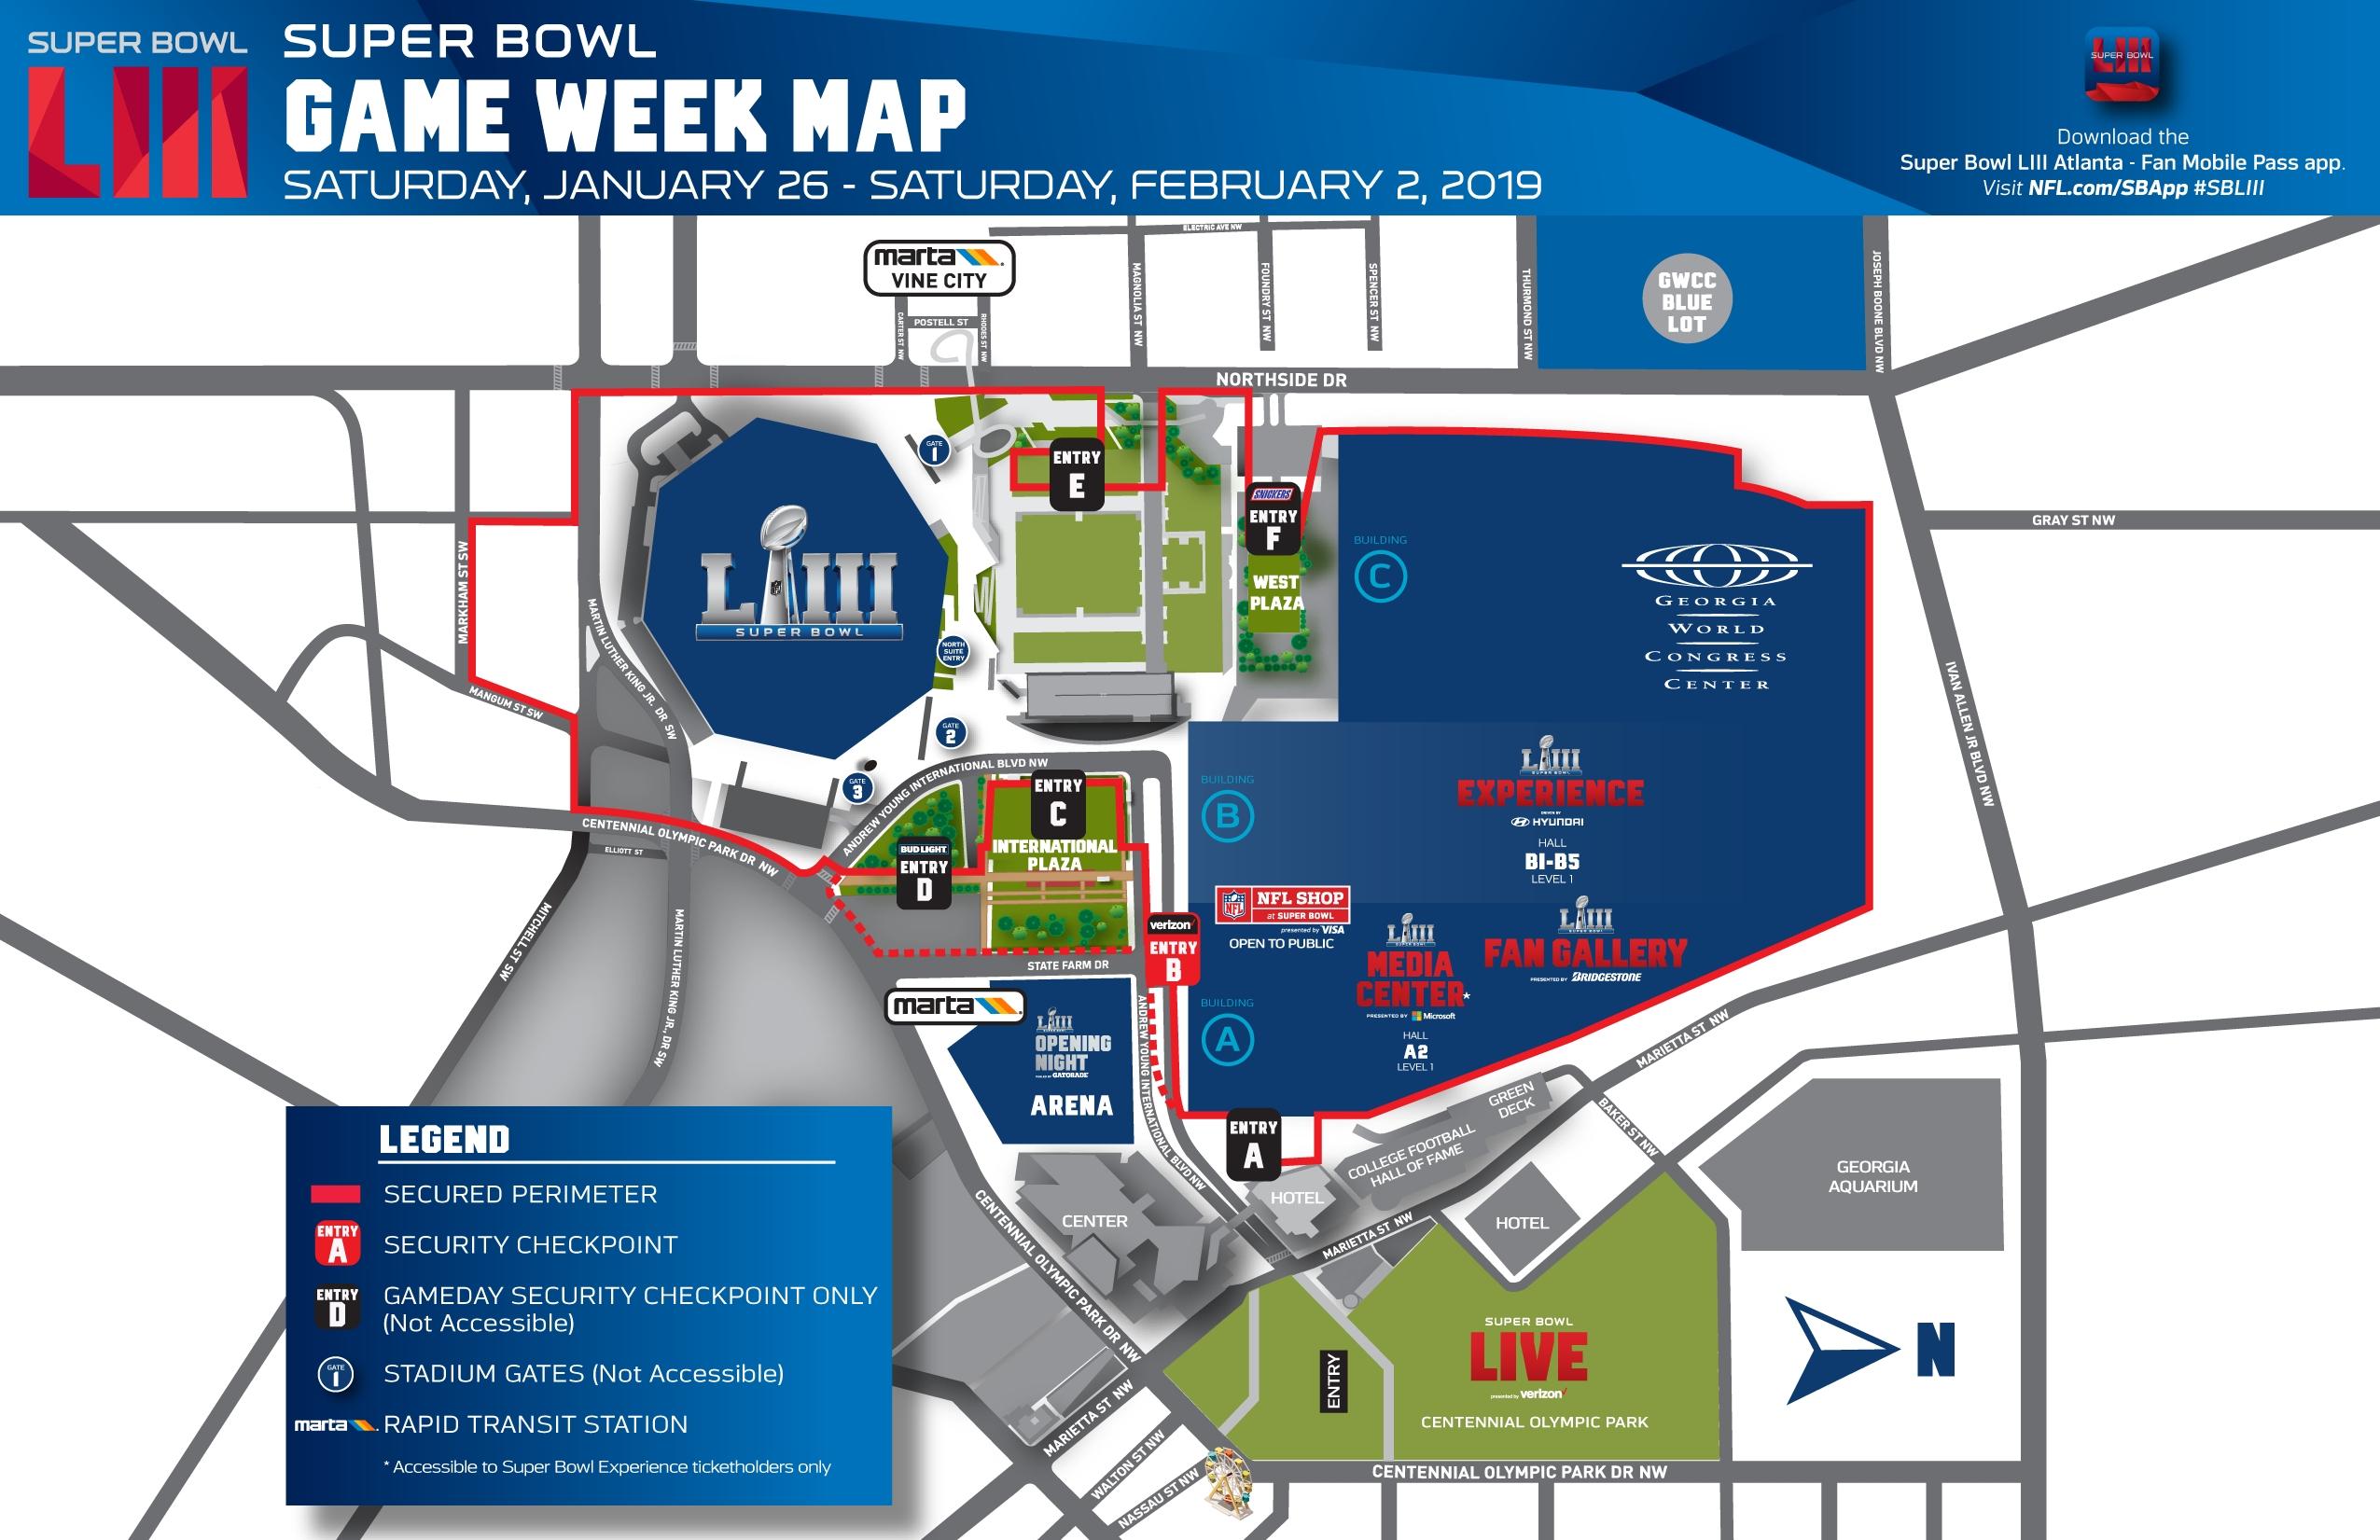 Super Bowl Hub - Mercedes Benz Stadium with Super Bowl 53 Seating Chart